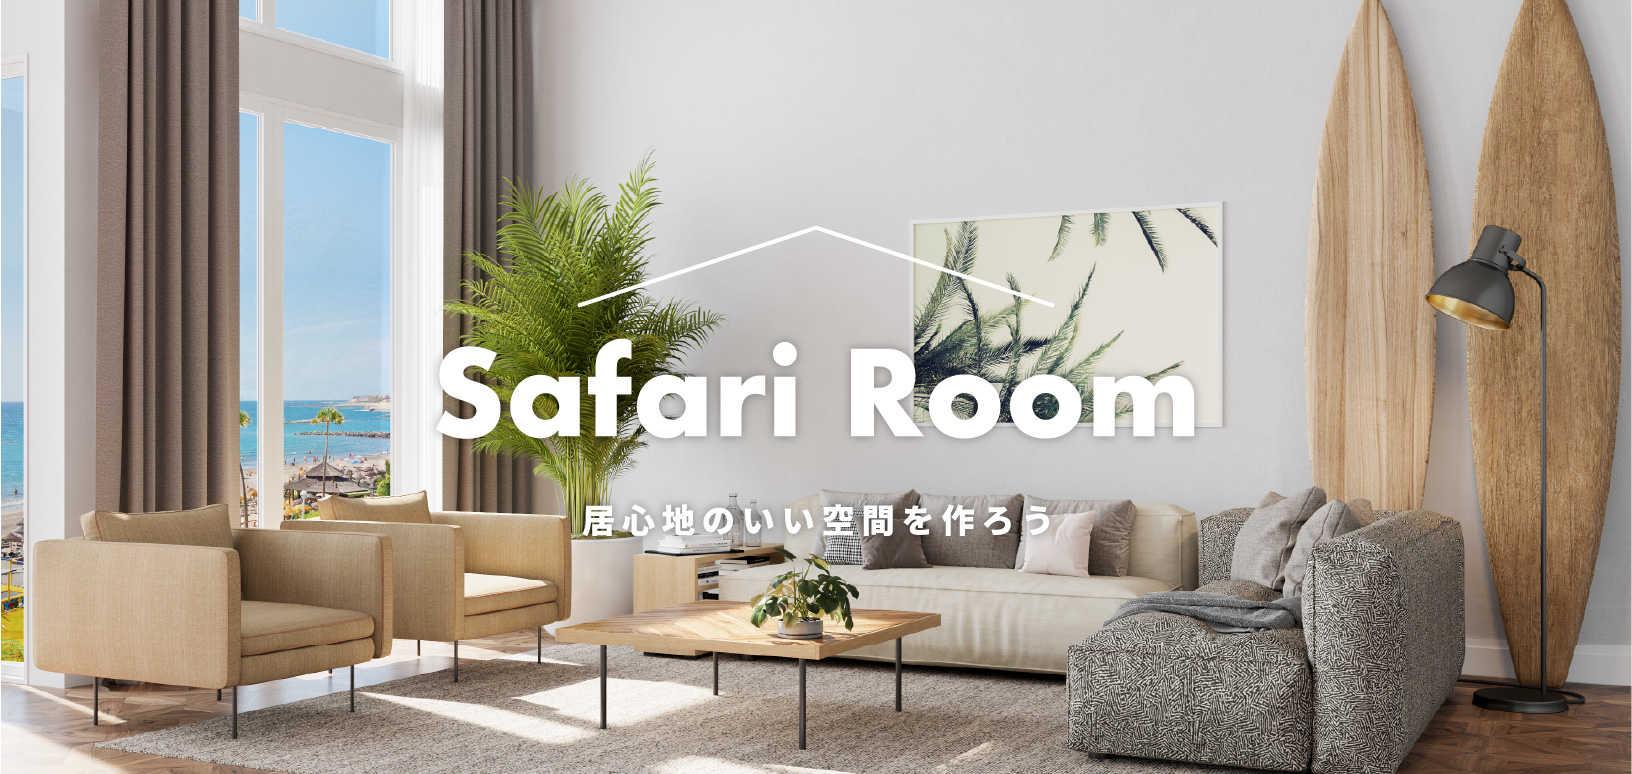 Safari Room